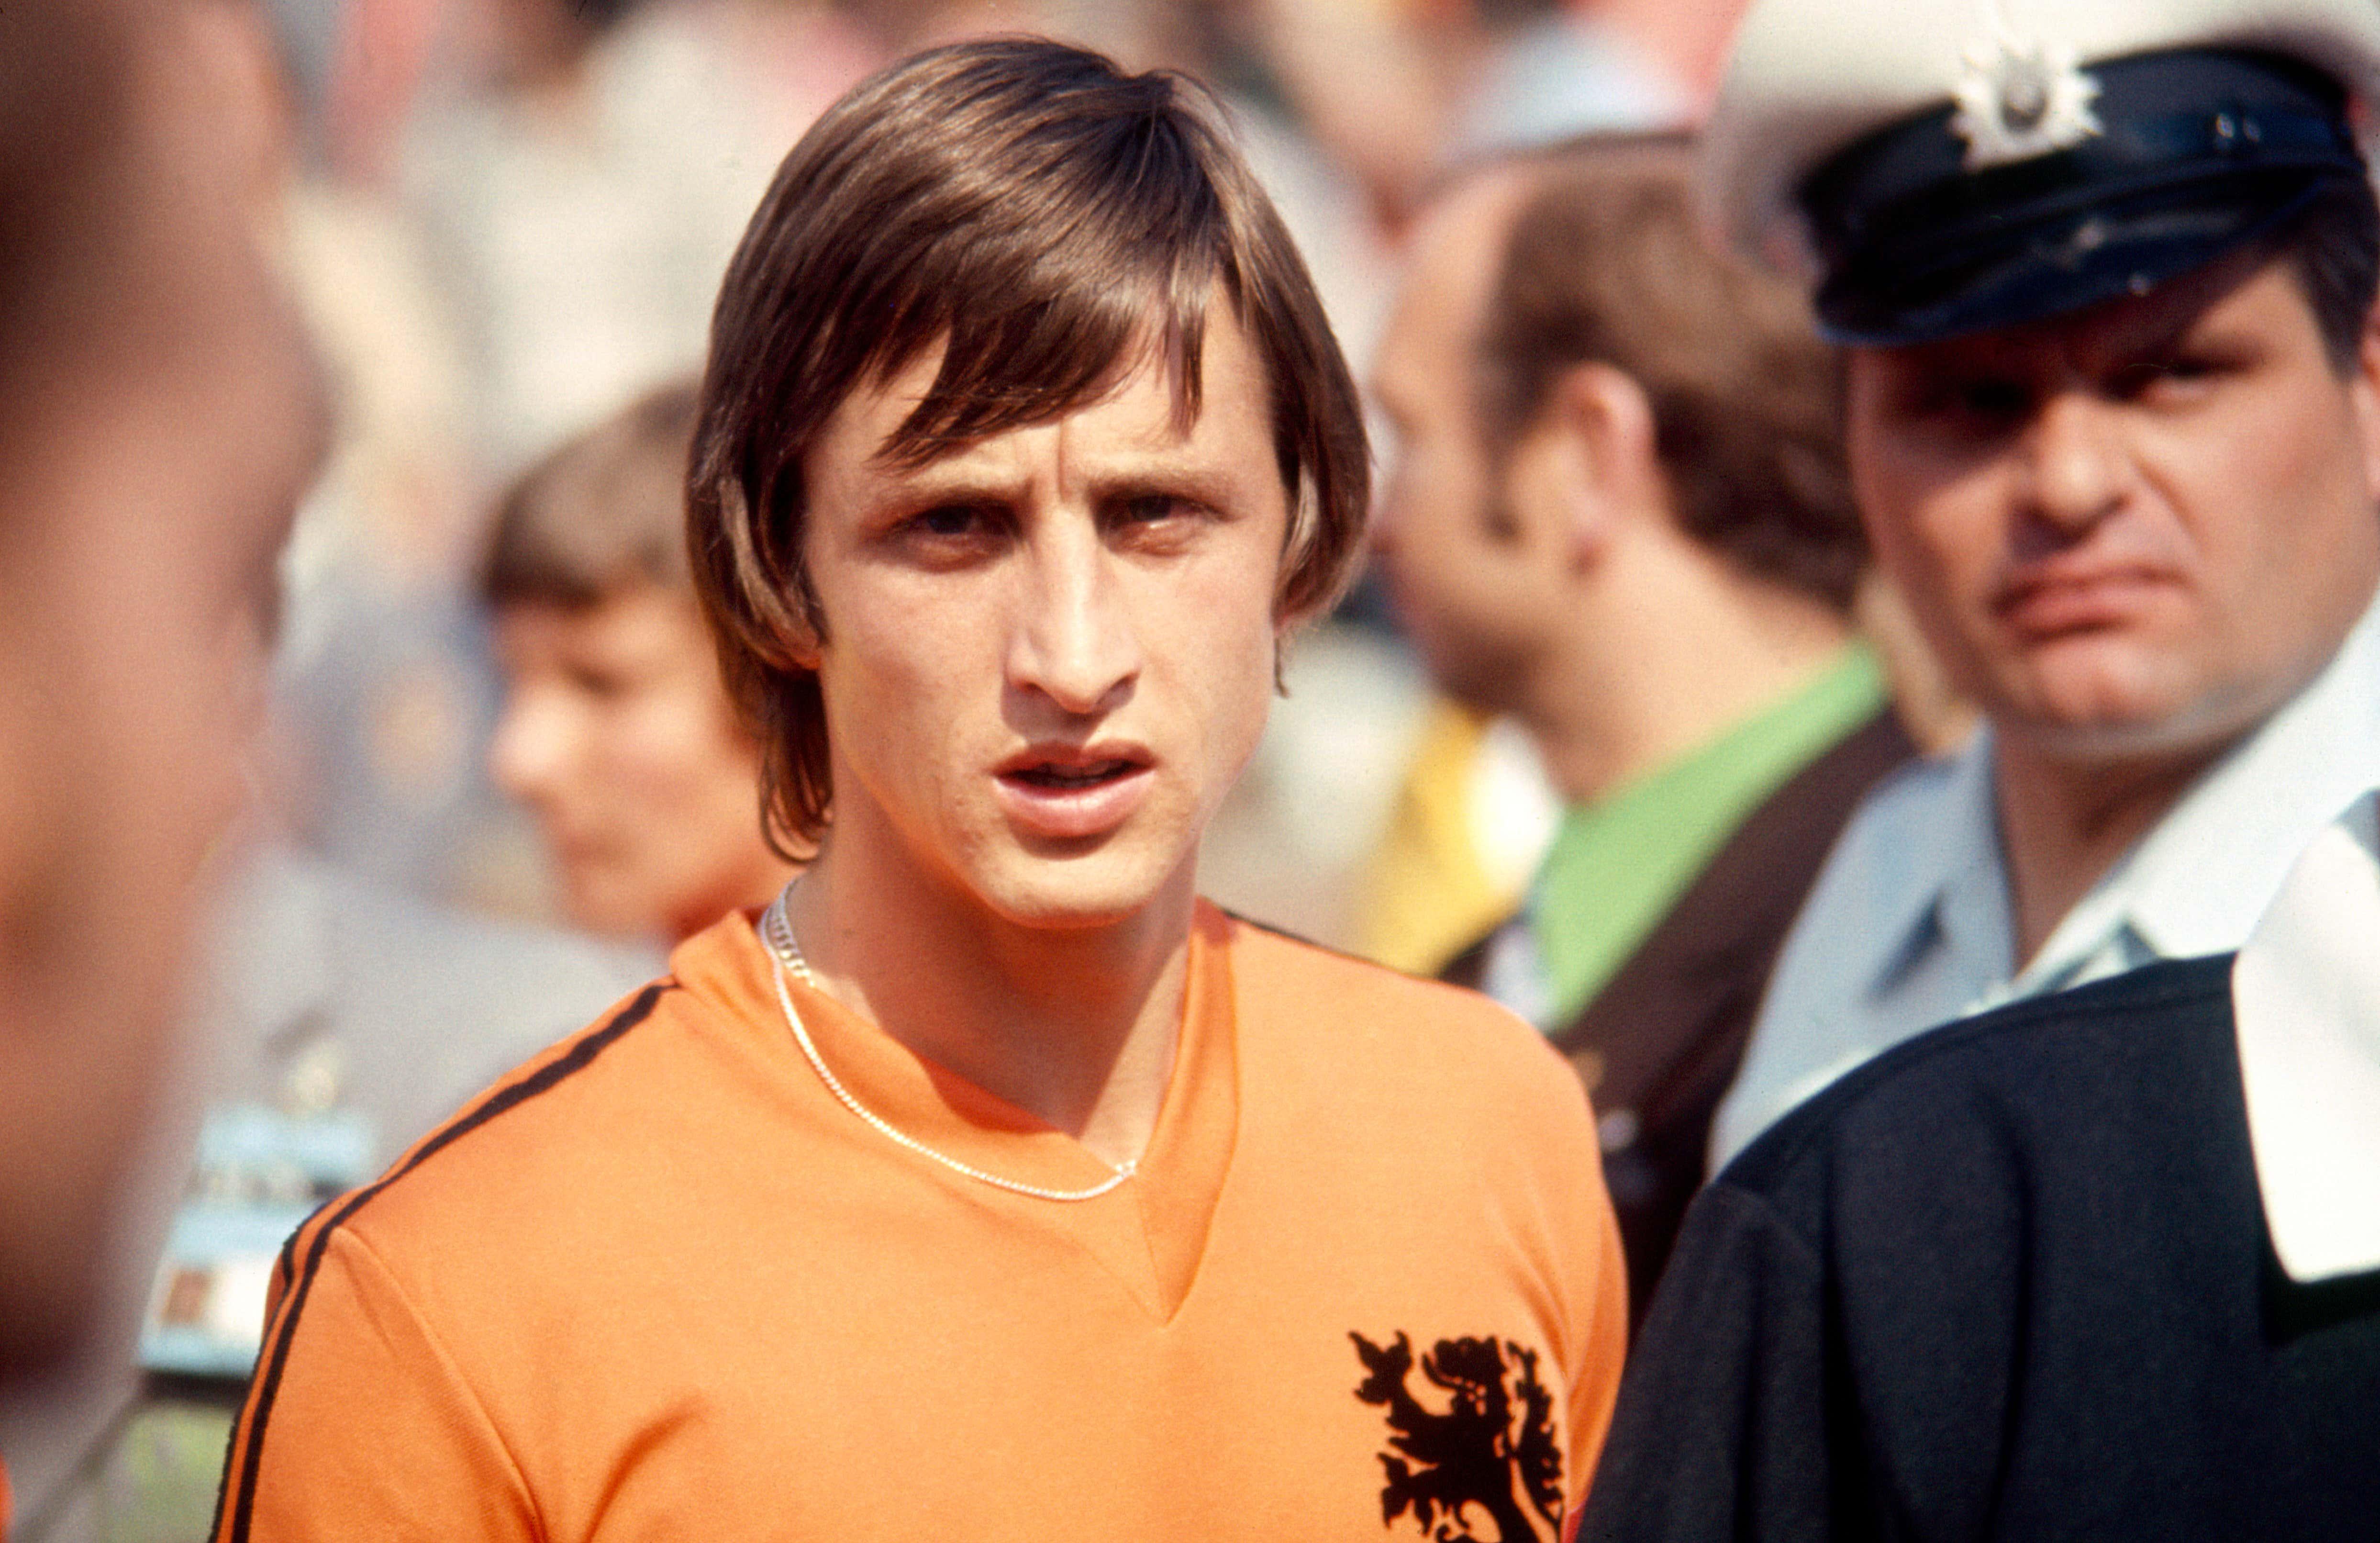 Total Football: Mimpi Sepakbola Murni Sang Legenda Sepakbola Johan Cruyff